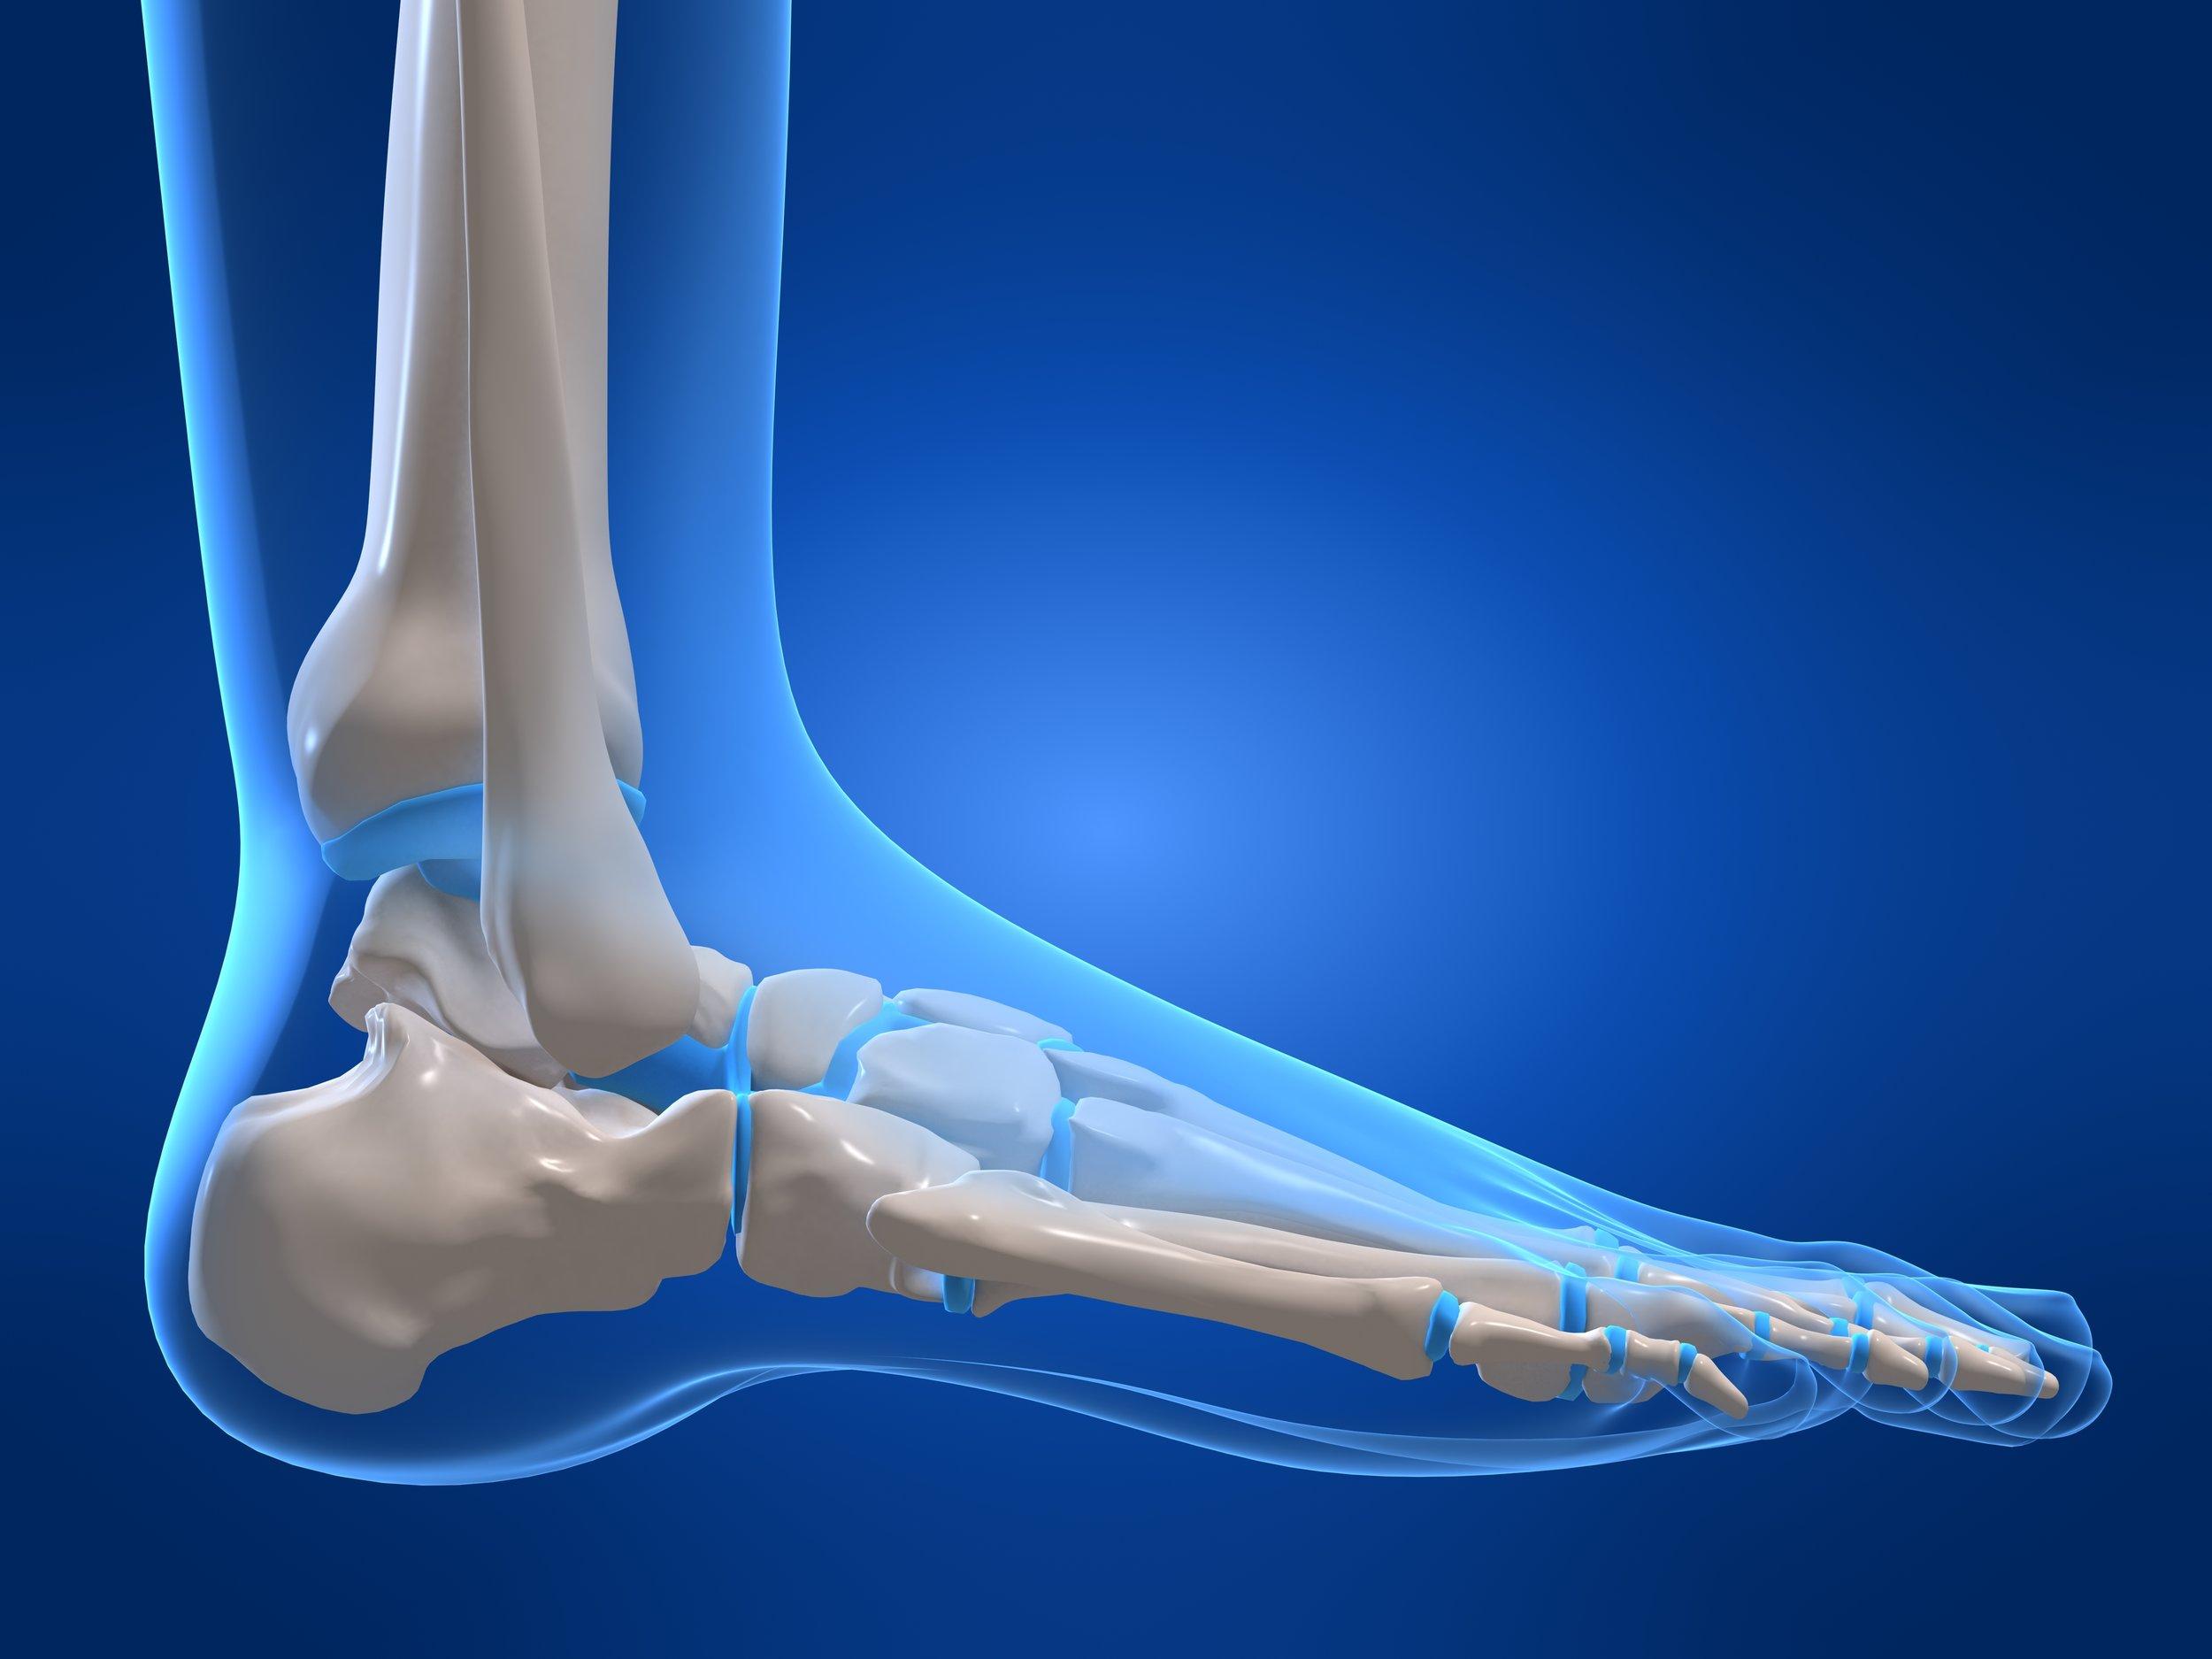 foot fracture treatment westfield indiana podiatrist david sullivan